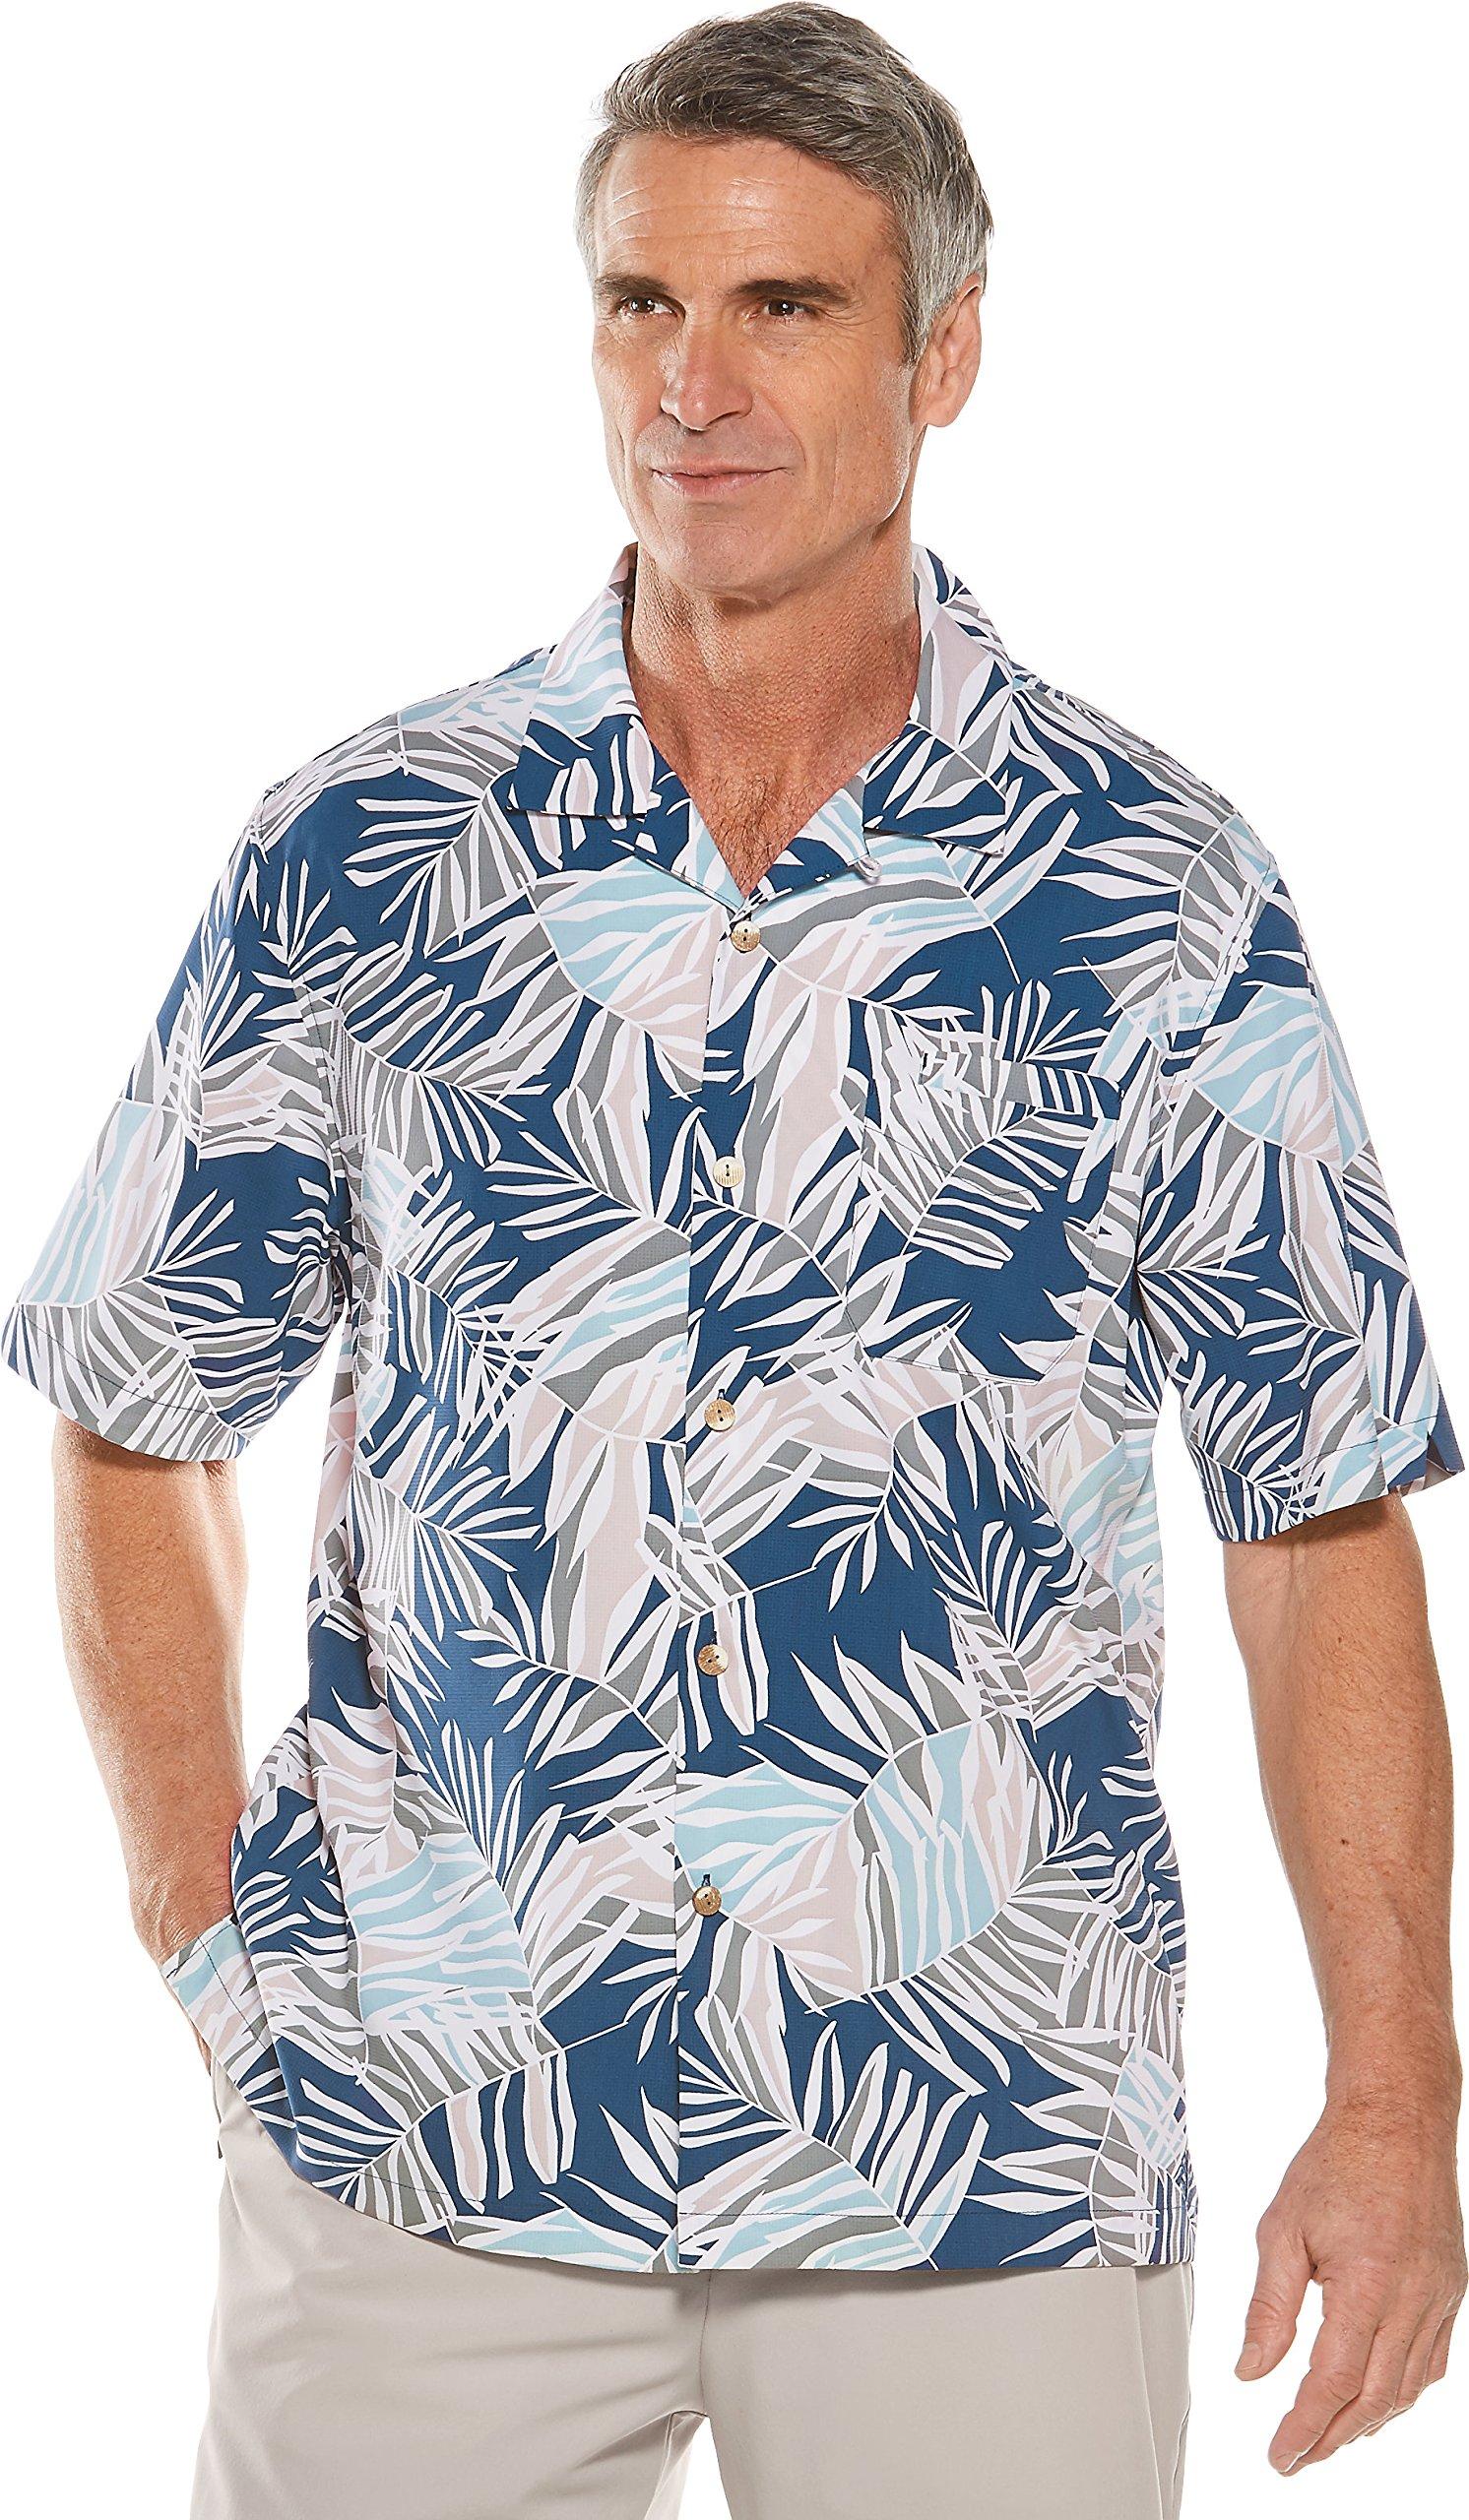 Coolibar UPF 50+ Men's Safari Camp Shirt - Sun Protective (Medium- Marine Navy Modern Palm)